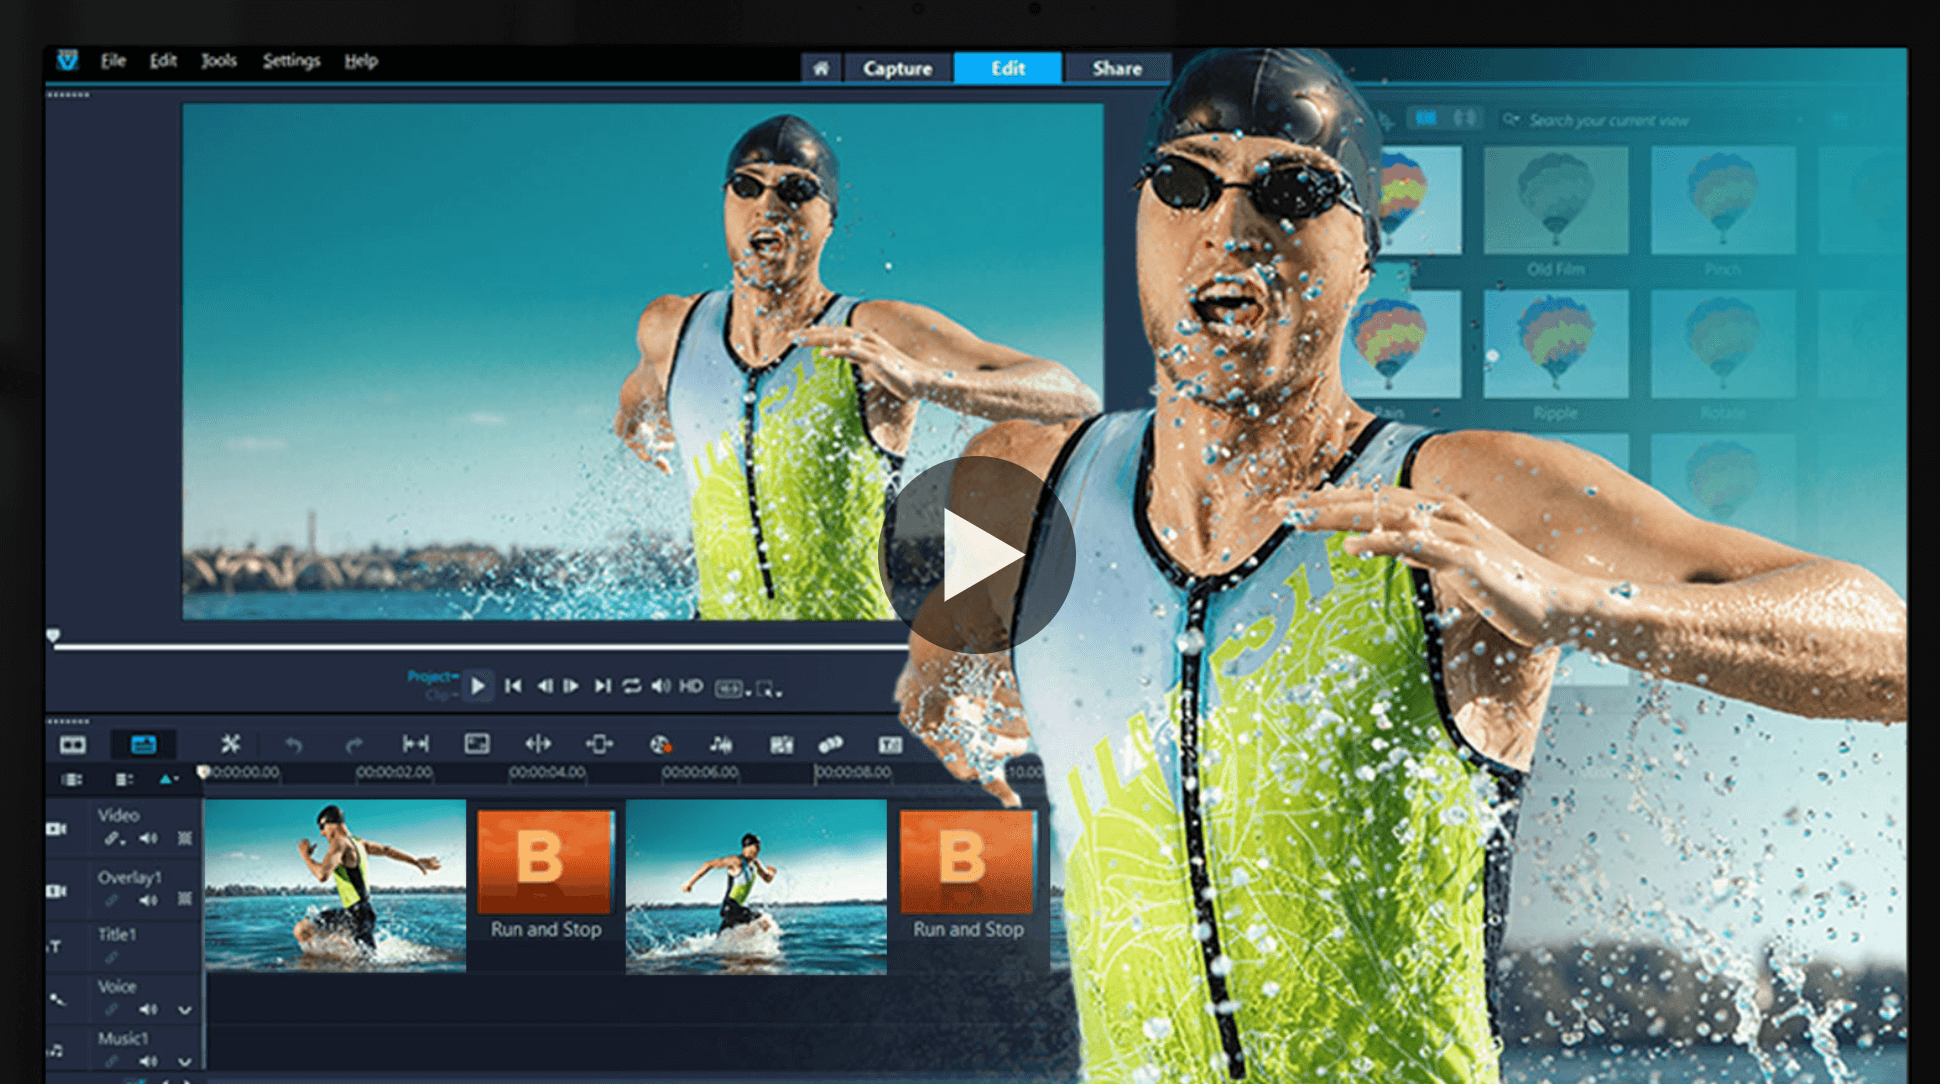 VideoStudioってどんなソフト?評価や他のソフトとの比較を紹介!